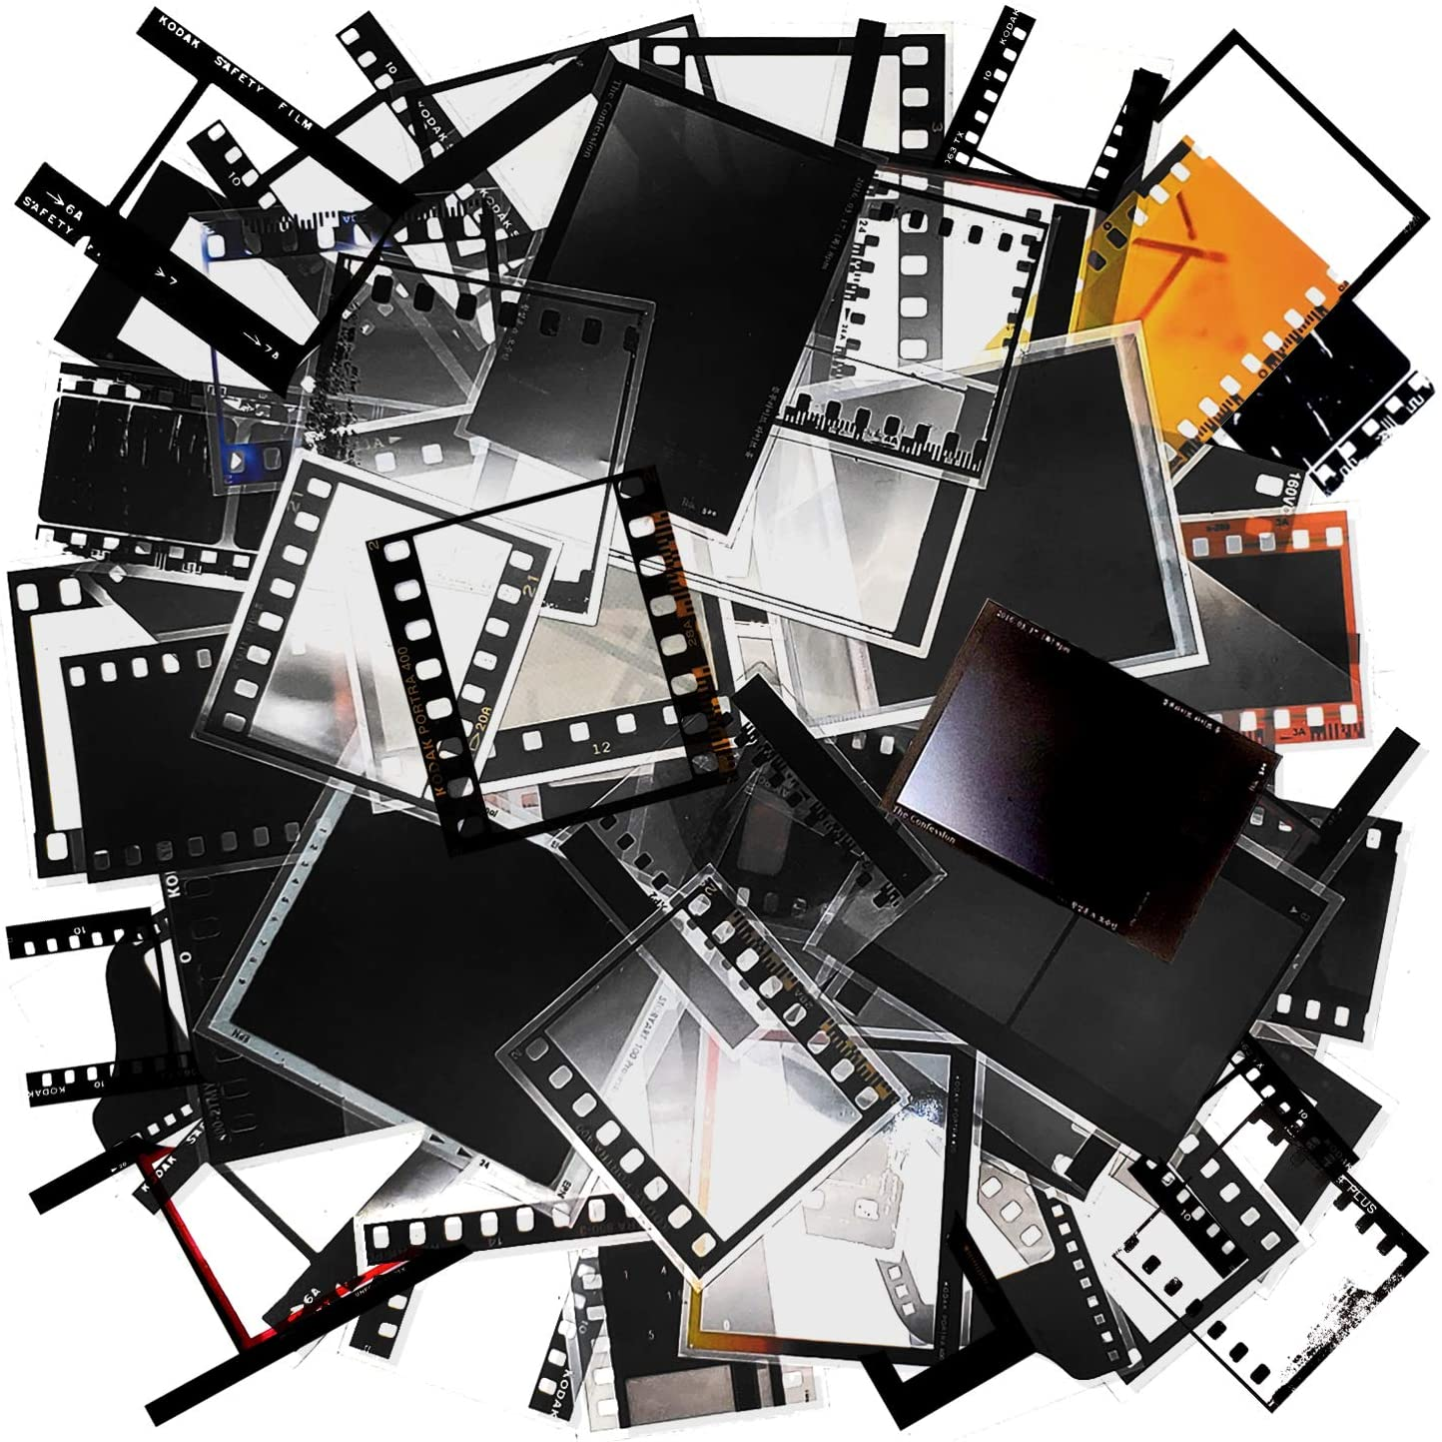 100 Sheets Retro Camera Film Sticker Decorative Filmstrip Scrapbook Sticker Photo Frame Sticker for Cinema Decoration Film Festival Poster DIY Photo Album Scrapbooking Diary Arts and Crafts (Memories)